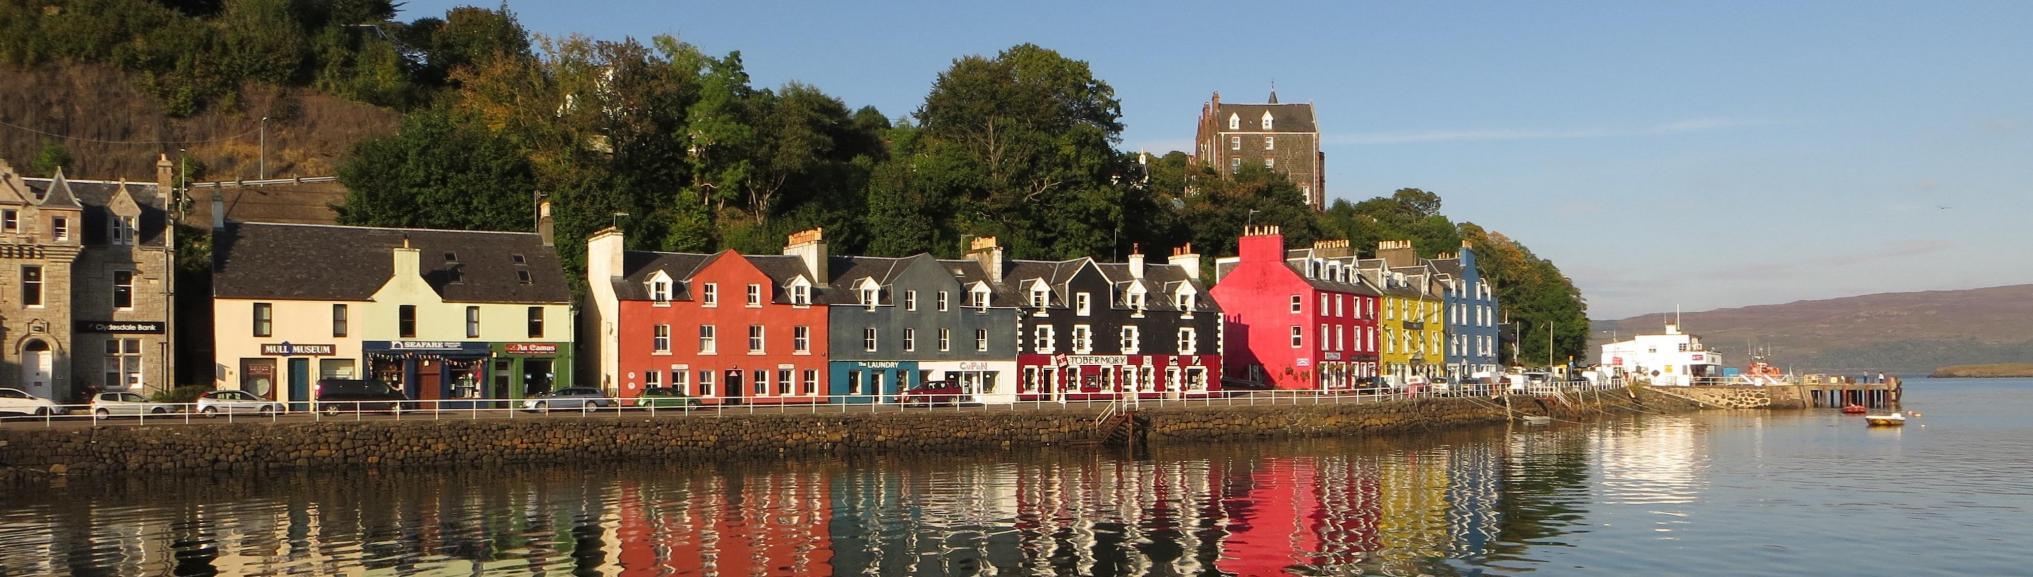 Gekleurde huisjes Mull, Binnen-Hebriden